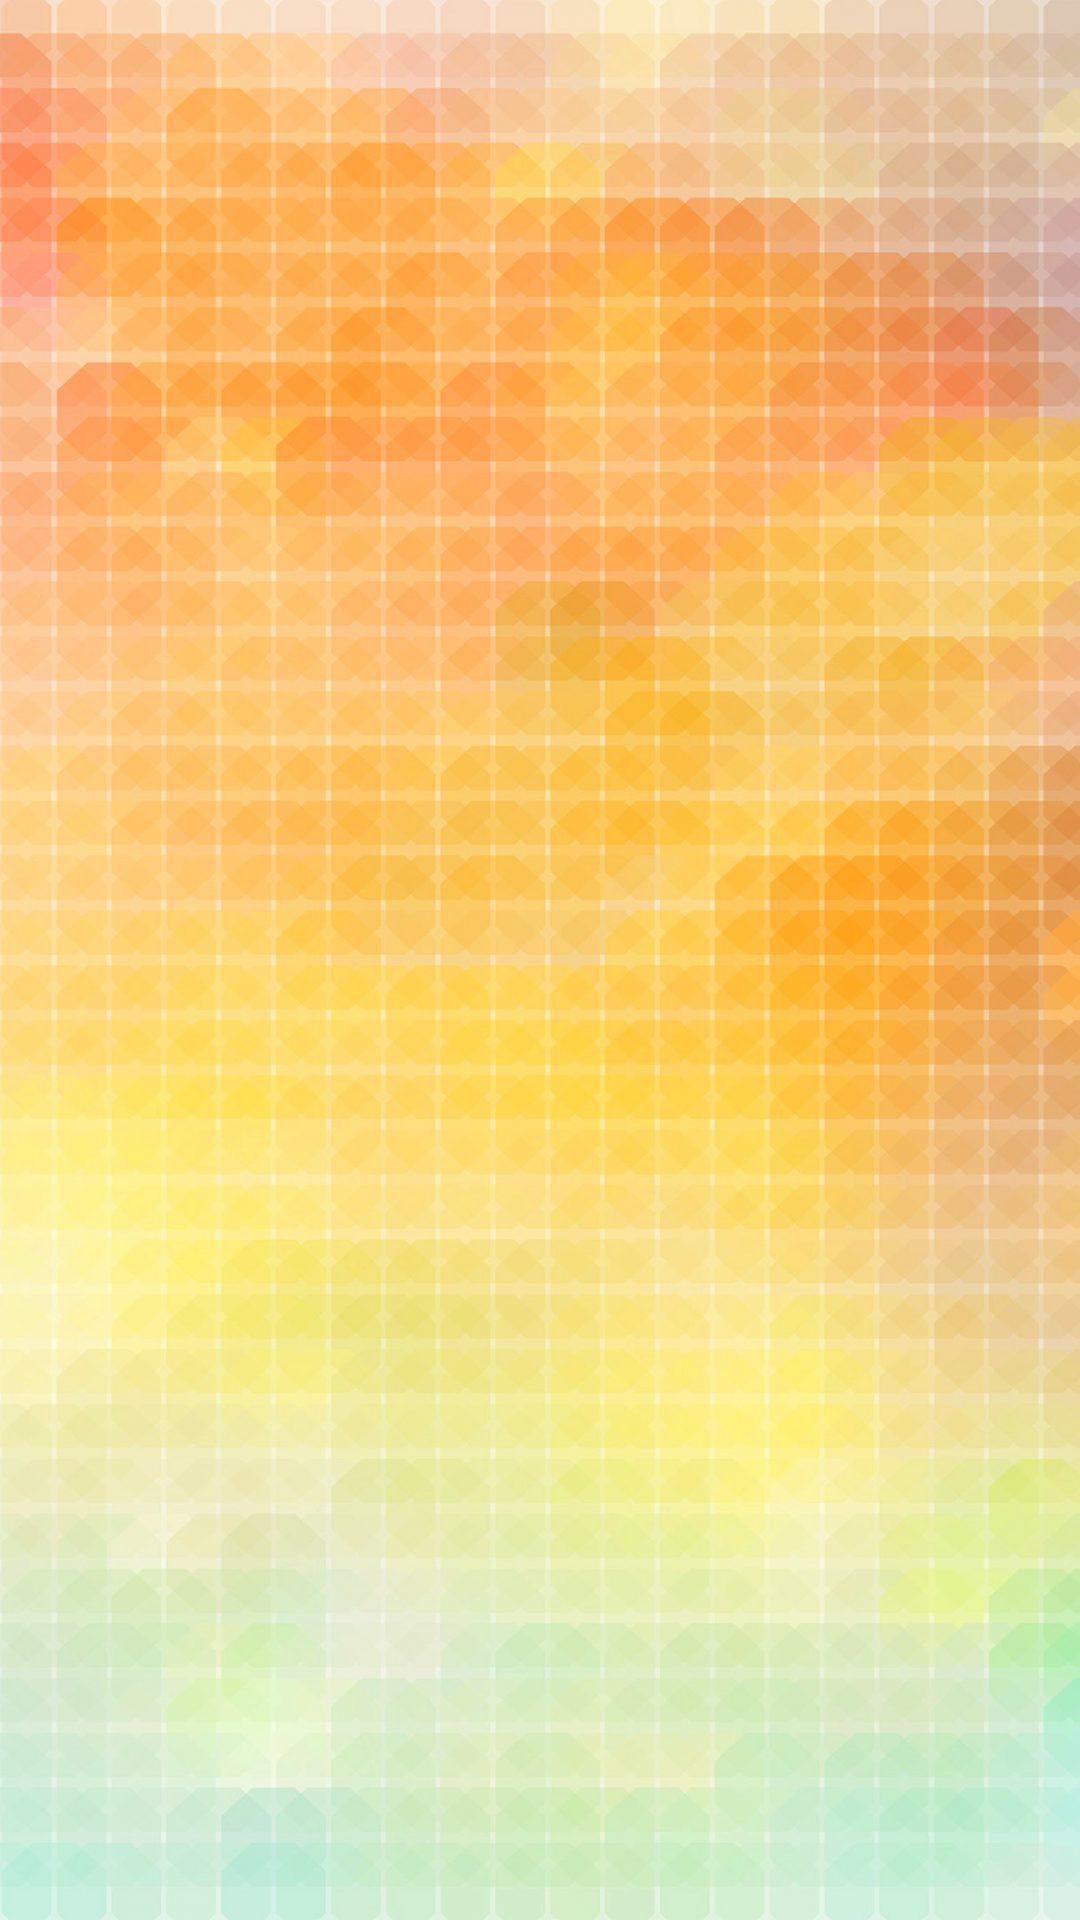 Bokeh Digital Abstract Art Pattern